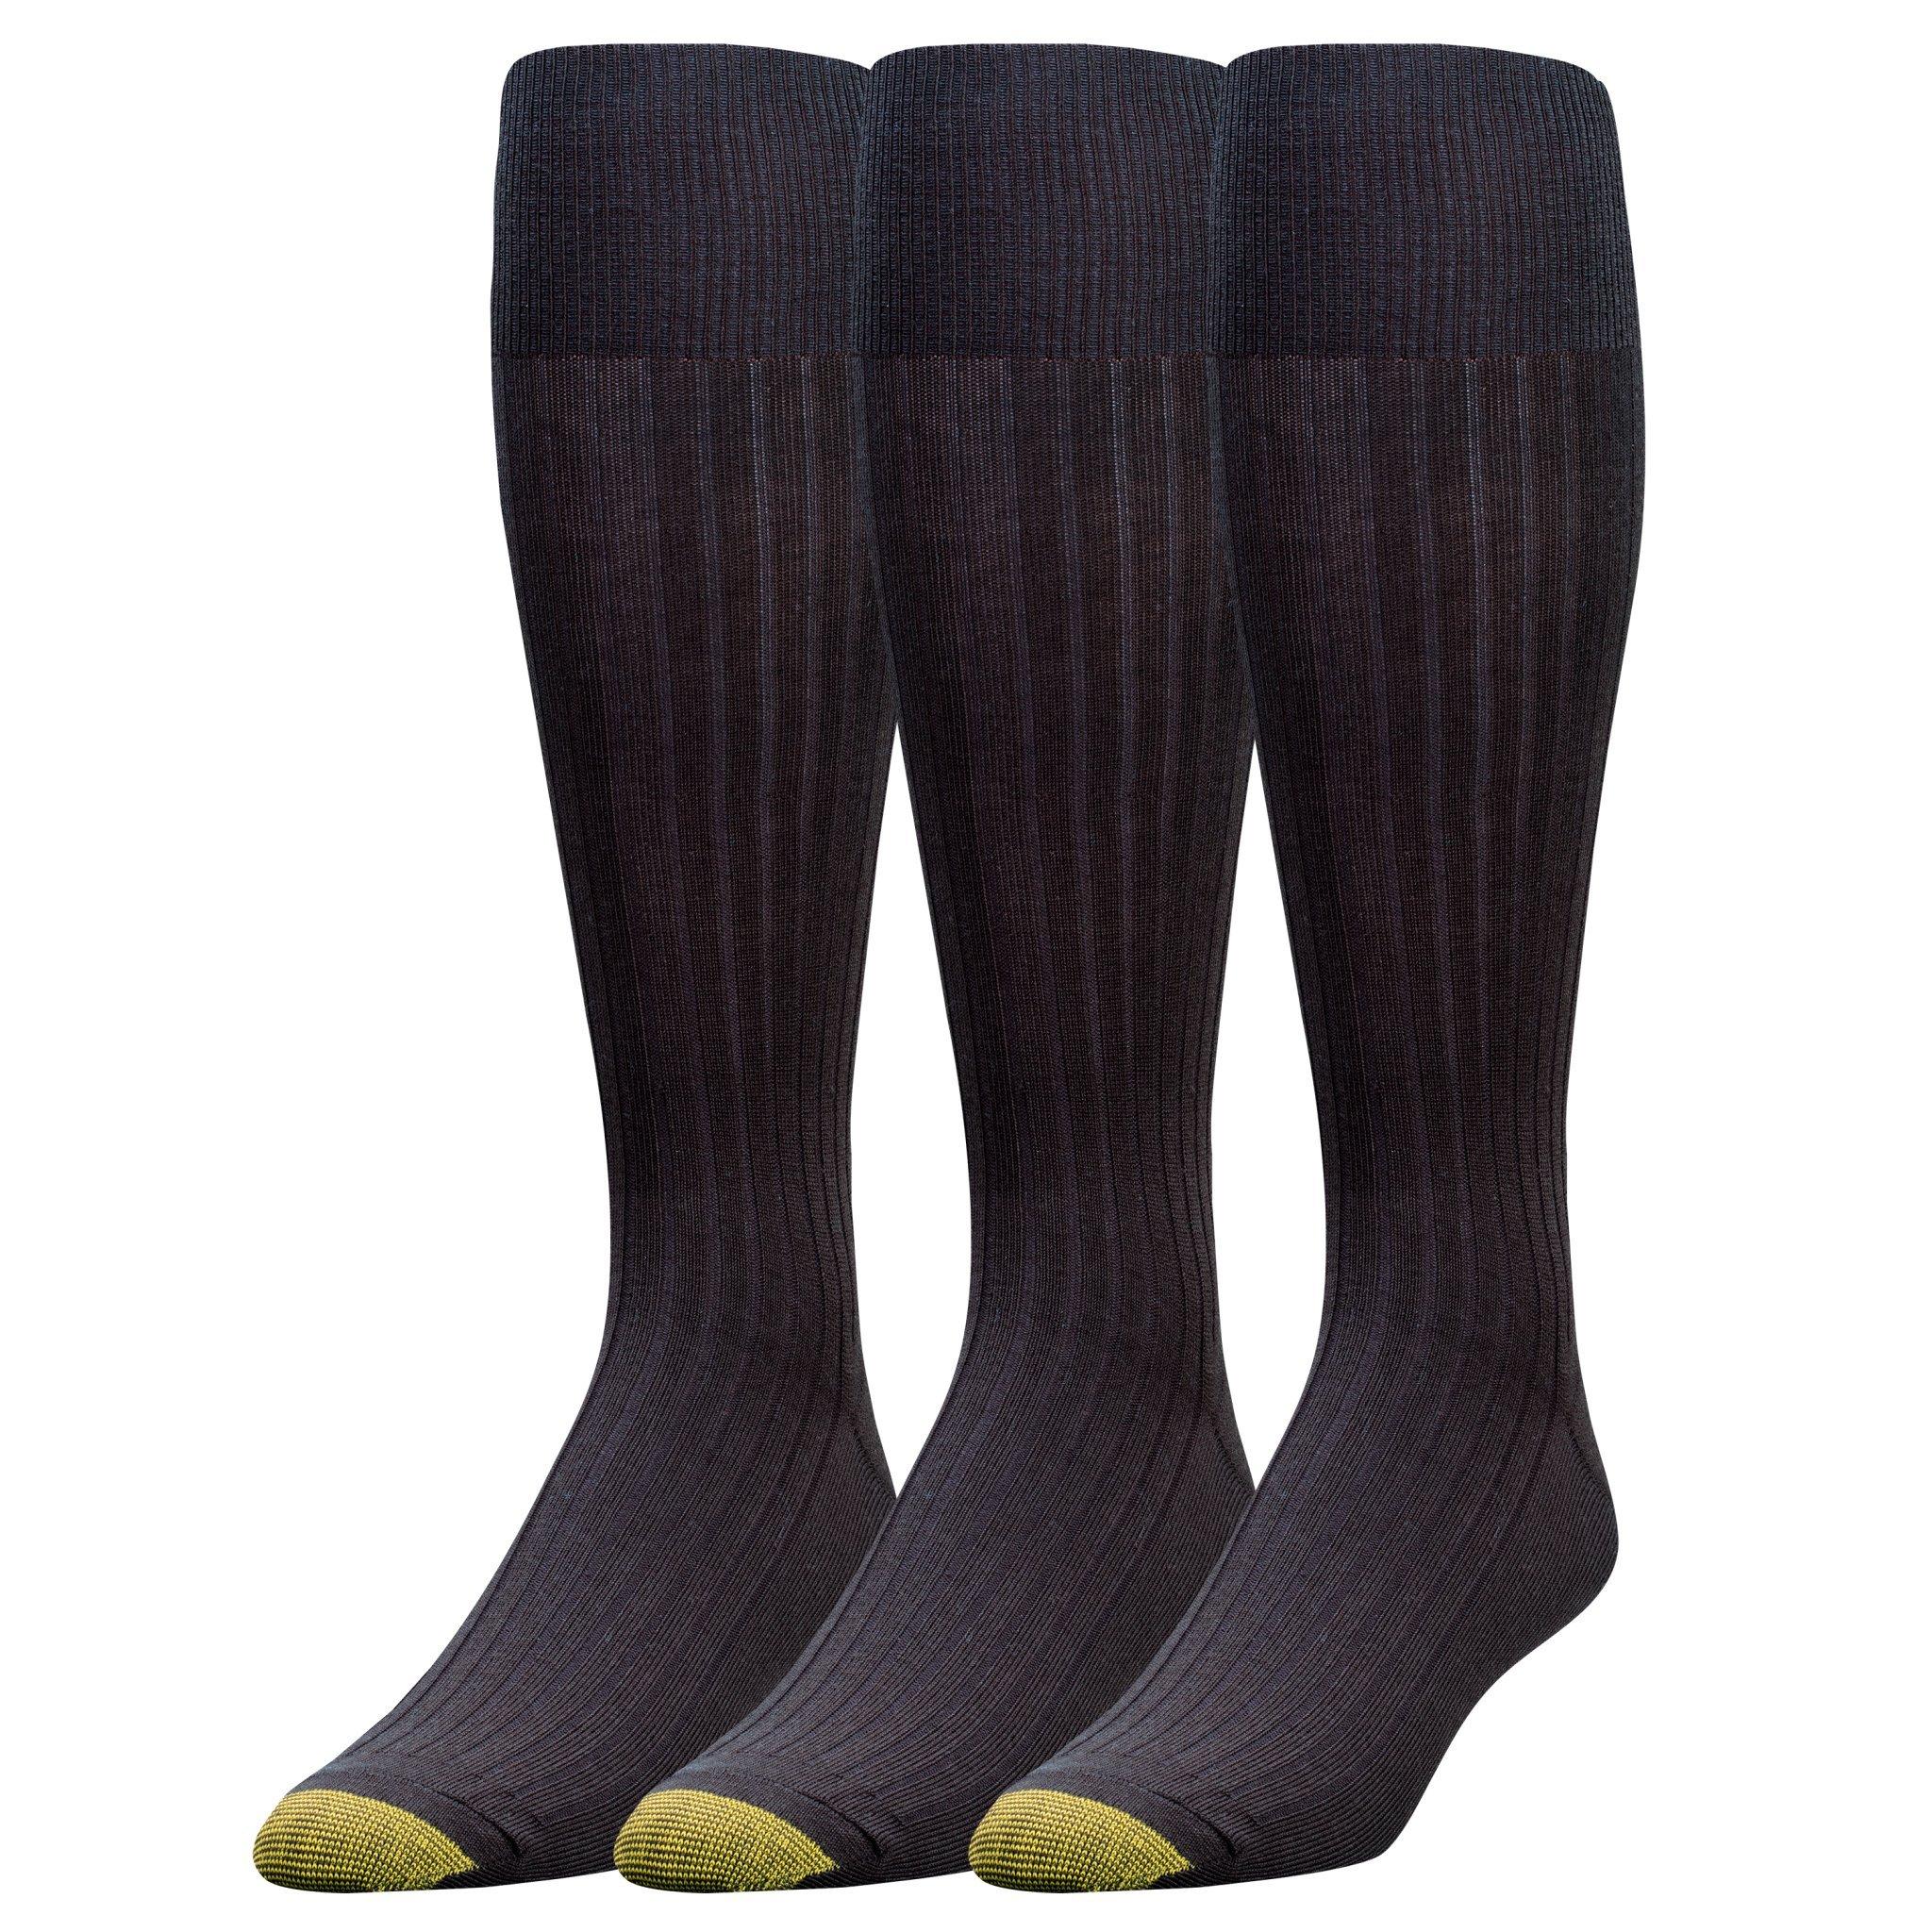 Gold Toe Men's Canterbury Over-the-Calf Dress Socks (Three-Pack),Black,10-13 (Shoe Size 6-12.5)